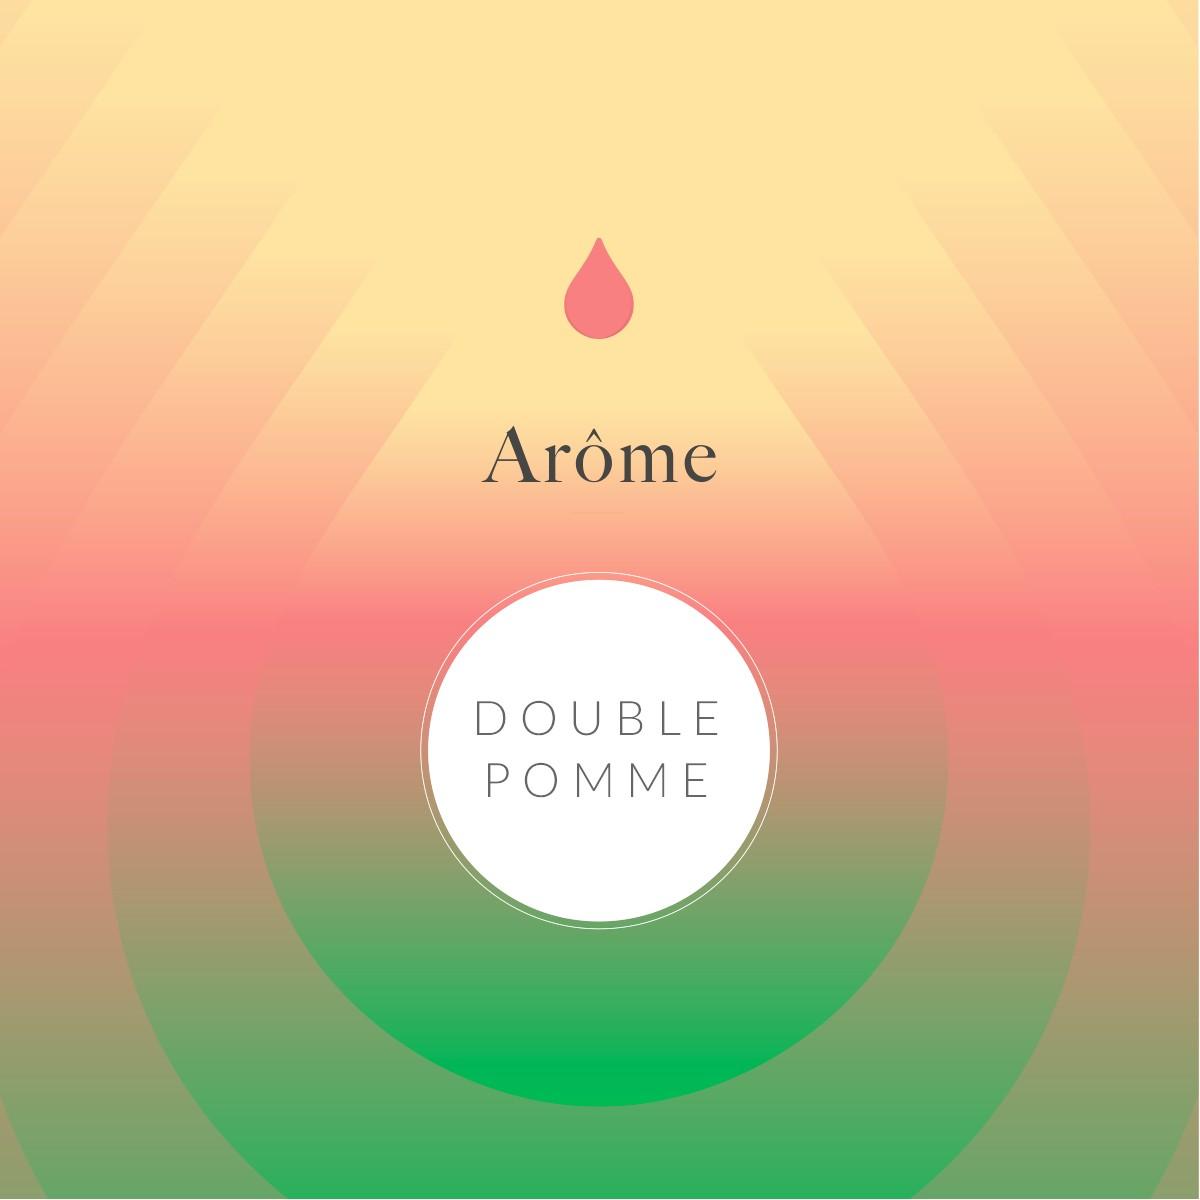 Double Pomme